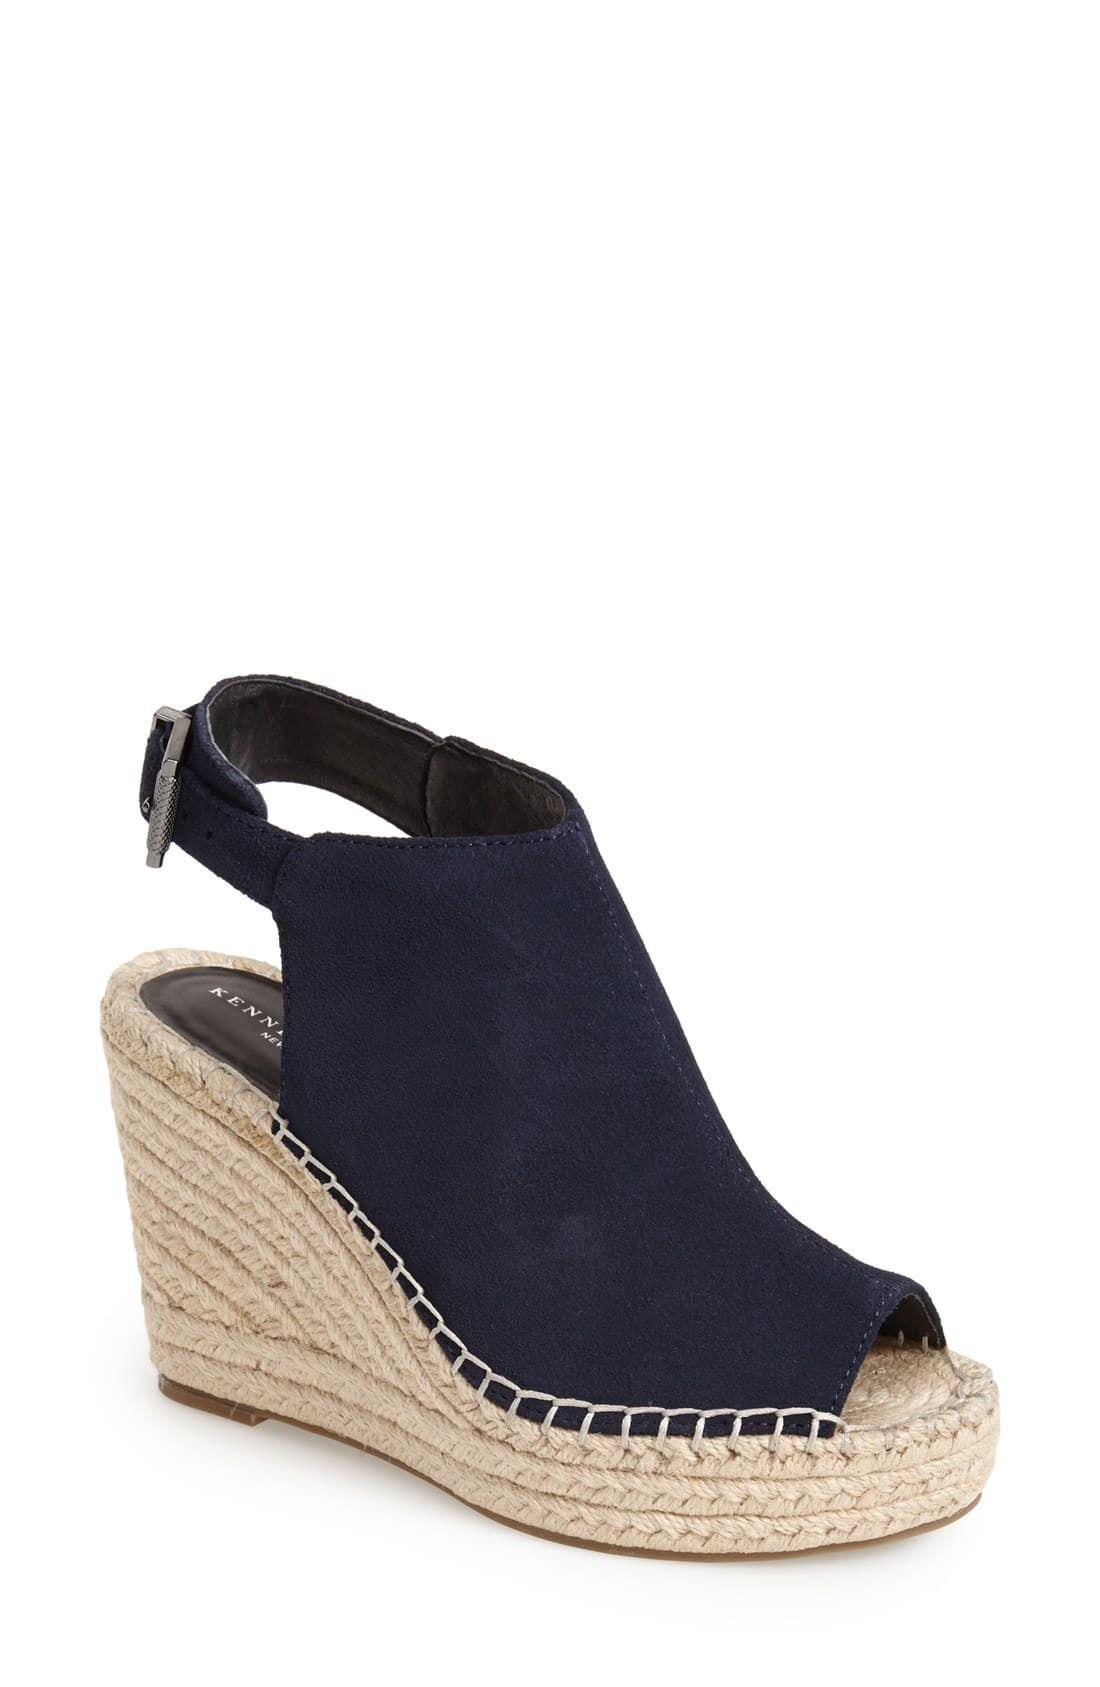 50863f4d755 Women's Kenneth Cole New York 'Olivia' Espadrille Wedge Sandal, Size ...